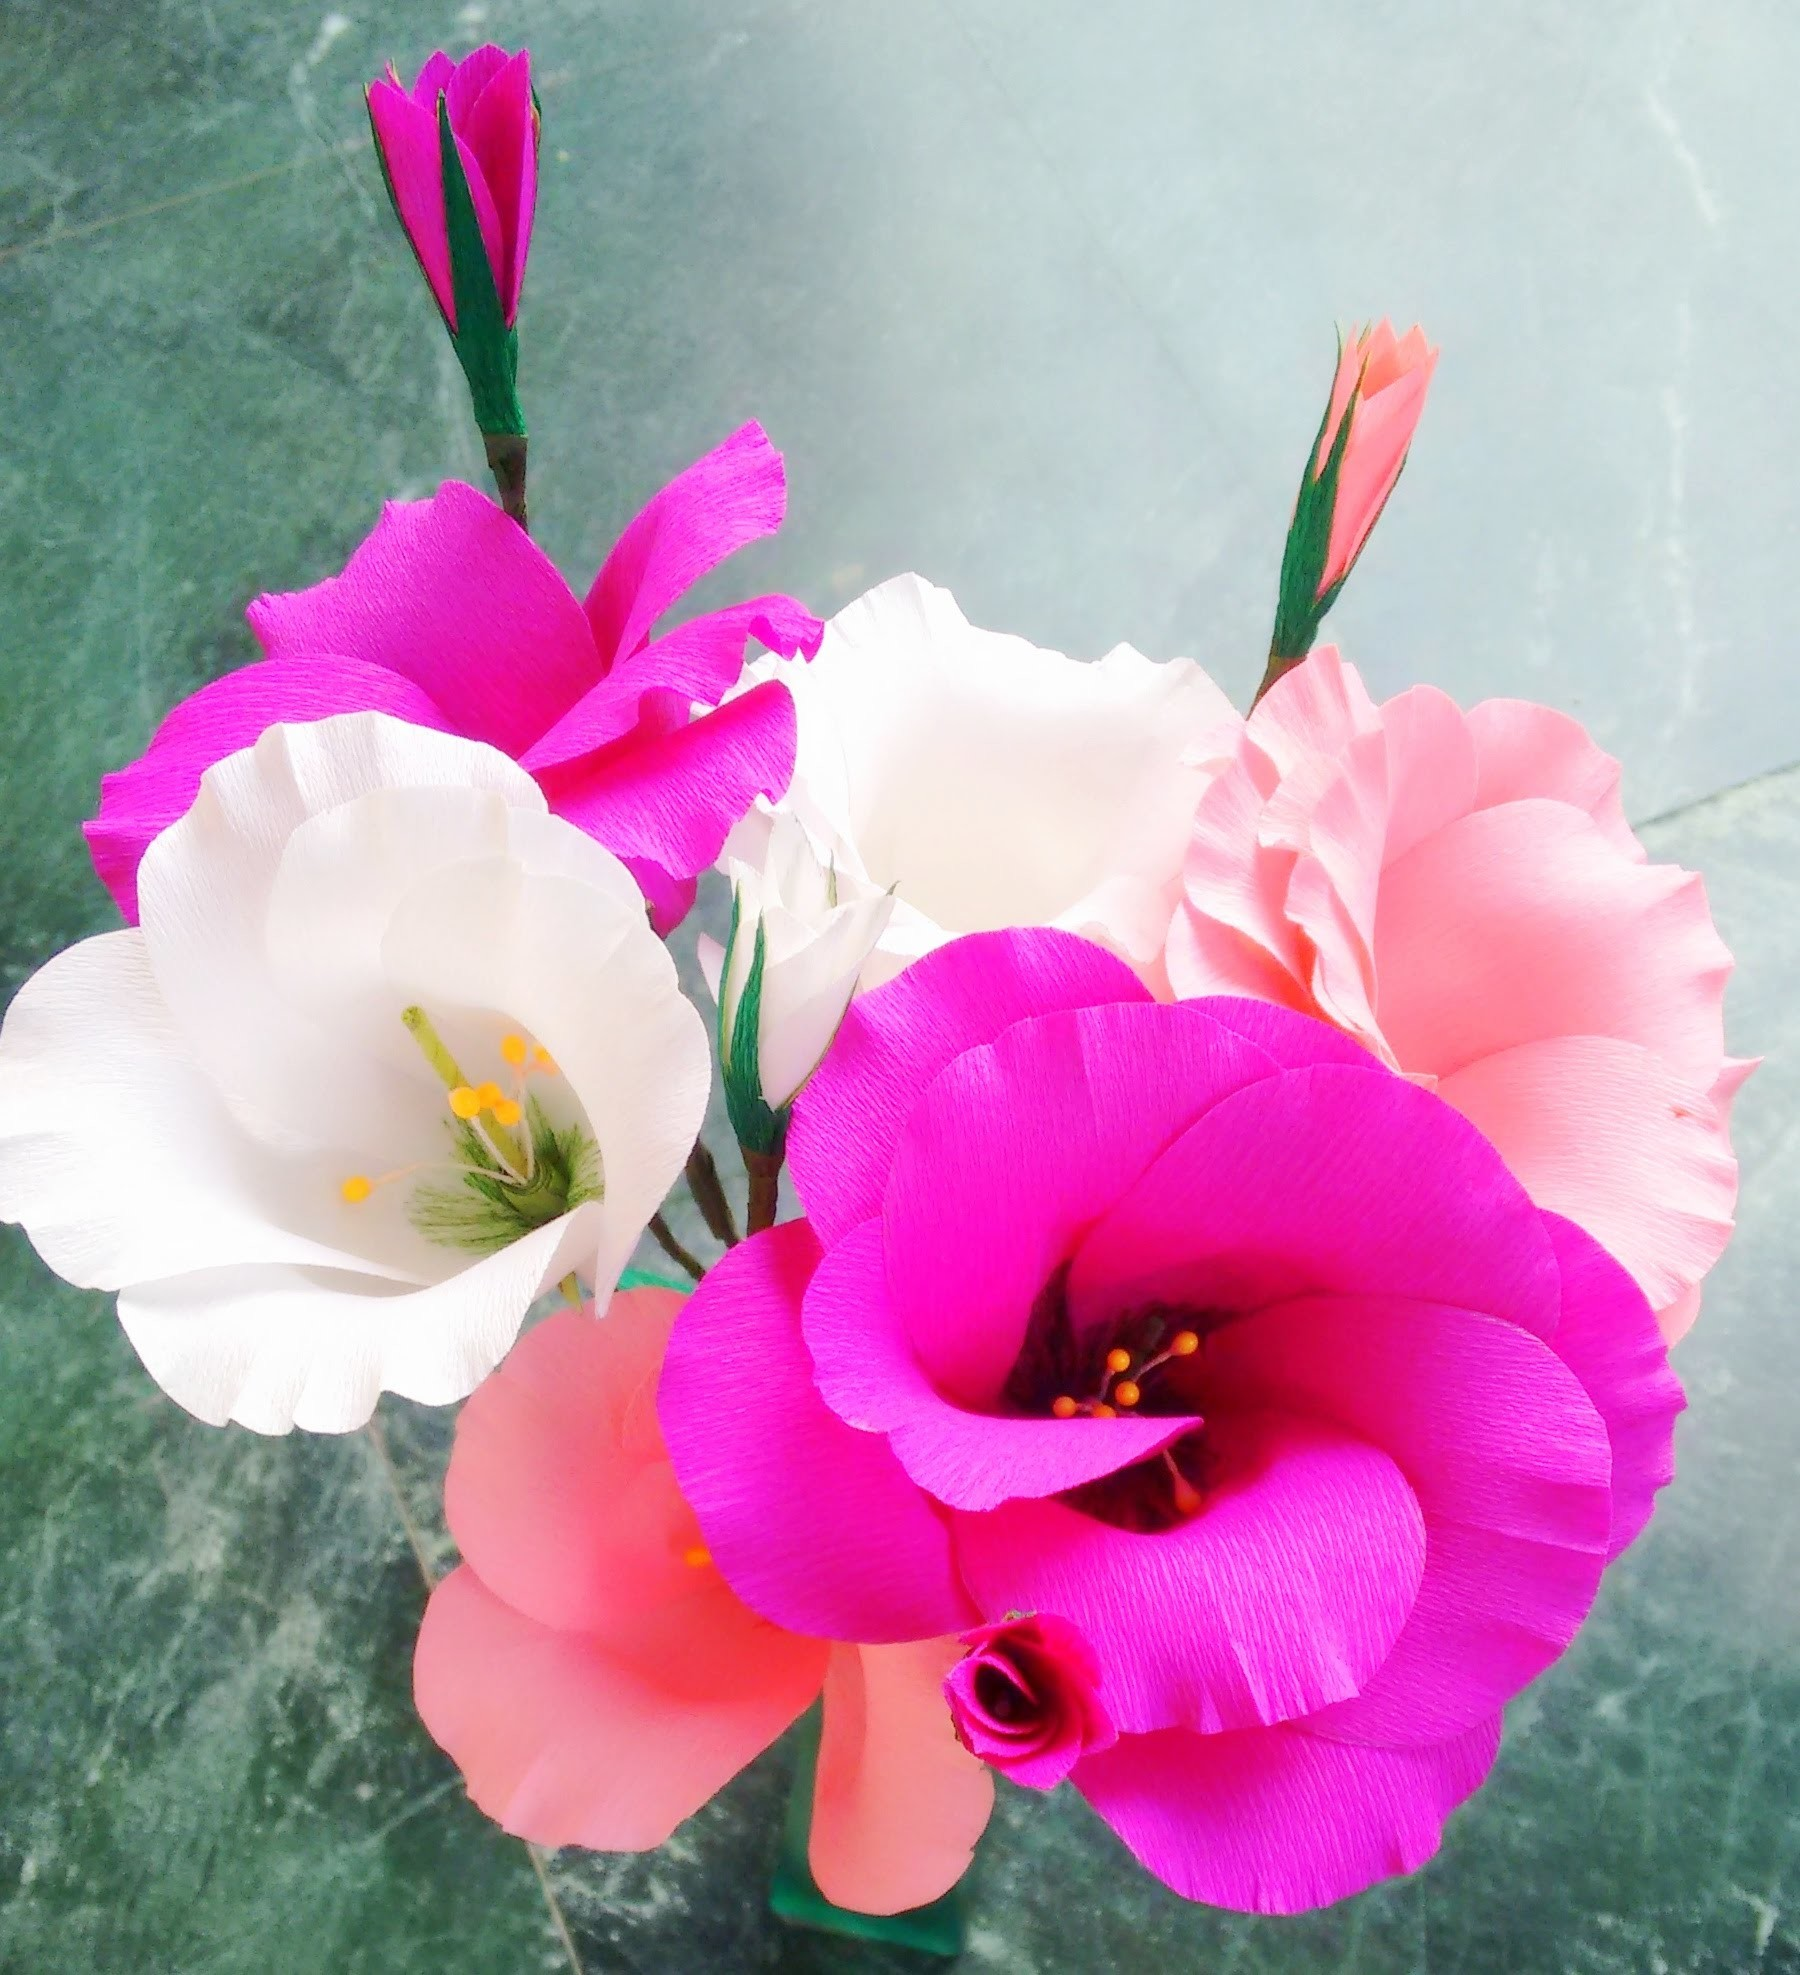 Paper flowers - Eustoma. Lisianthus - Single & Double